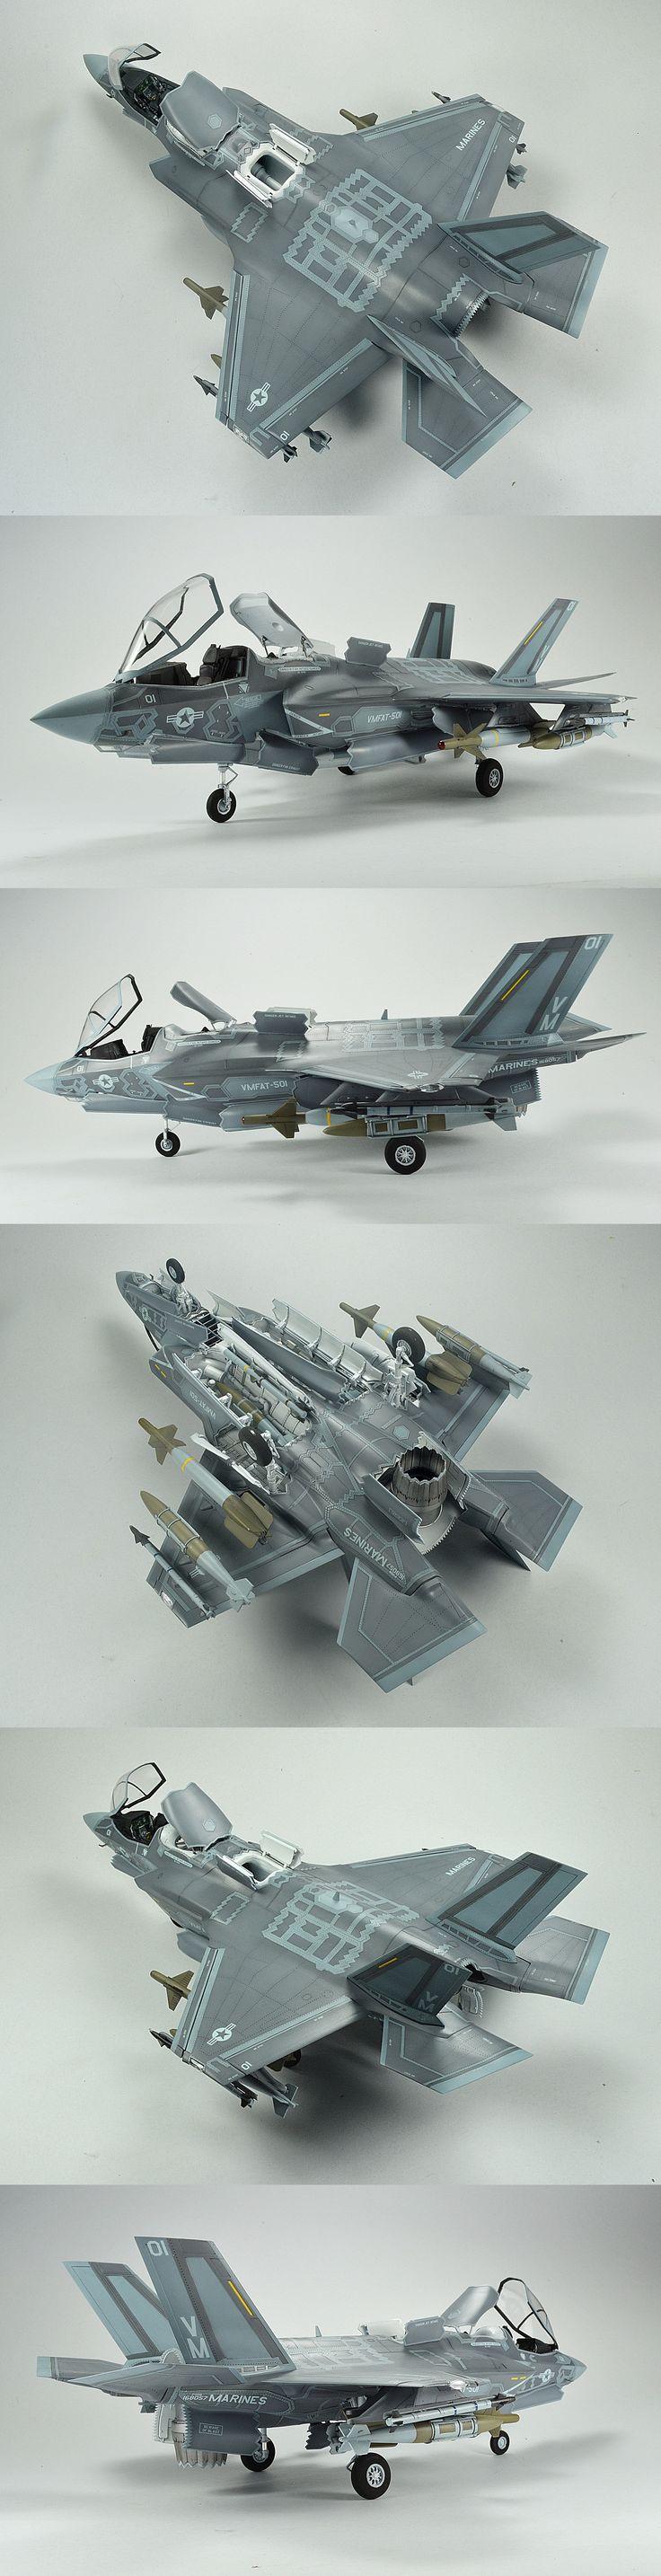 USMC F-35B Lightning II | Unknown Scale